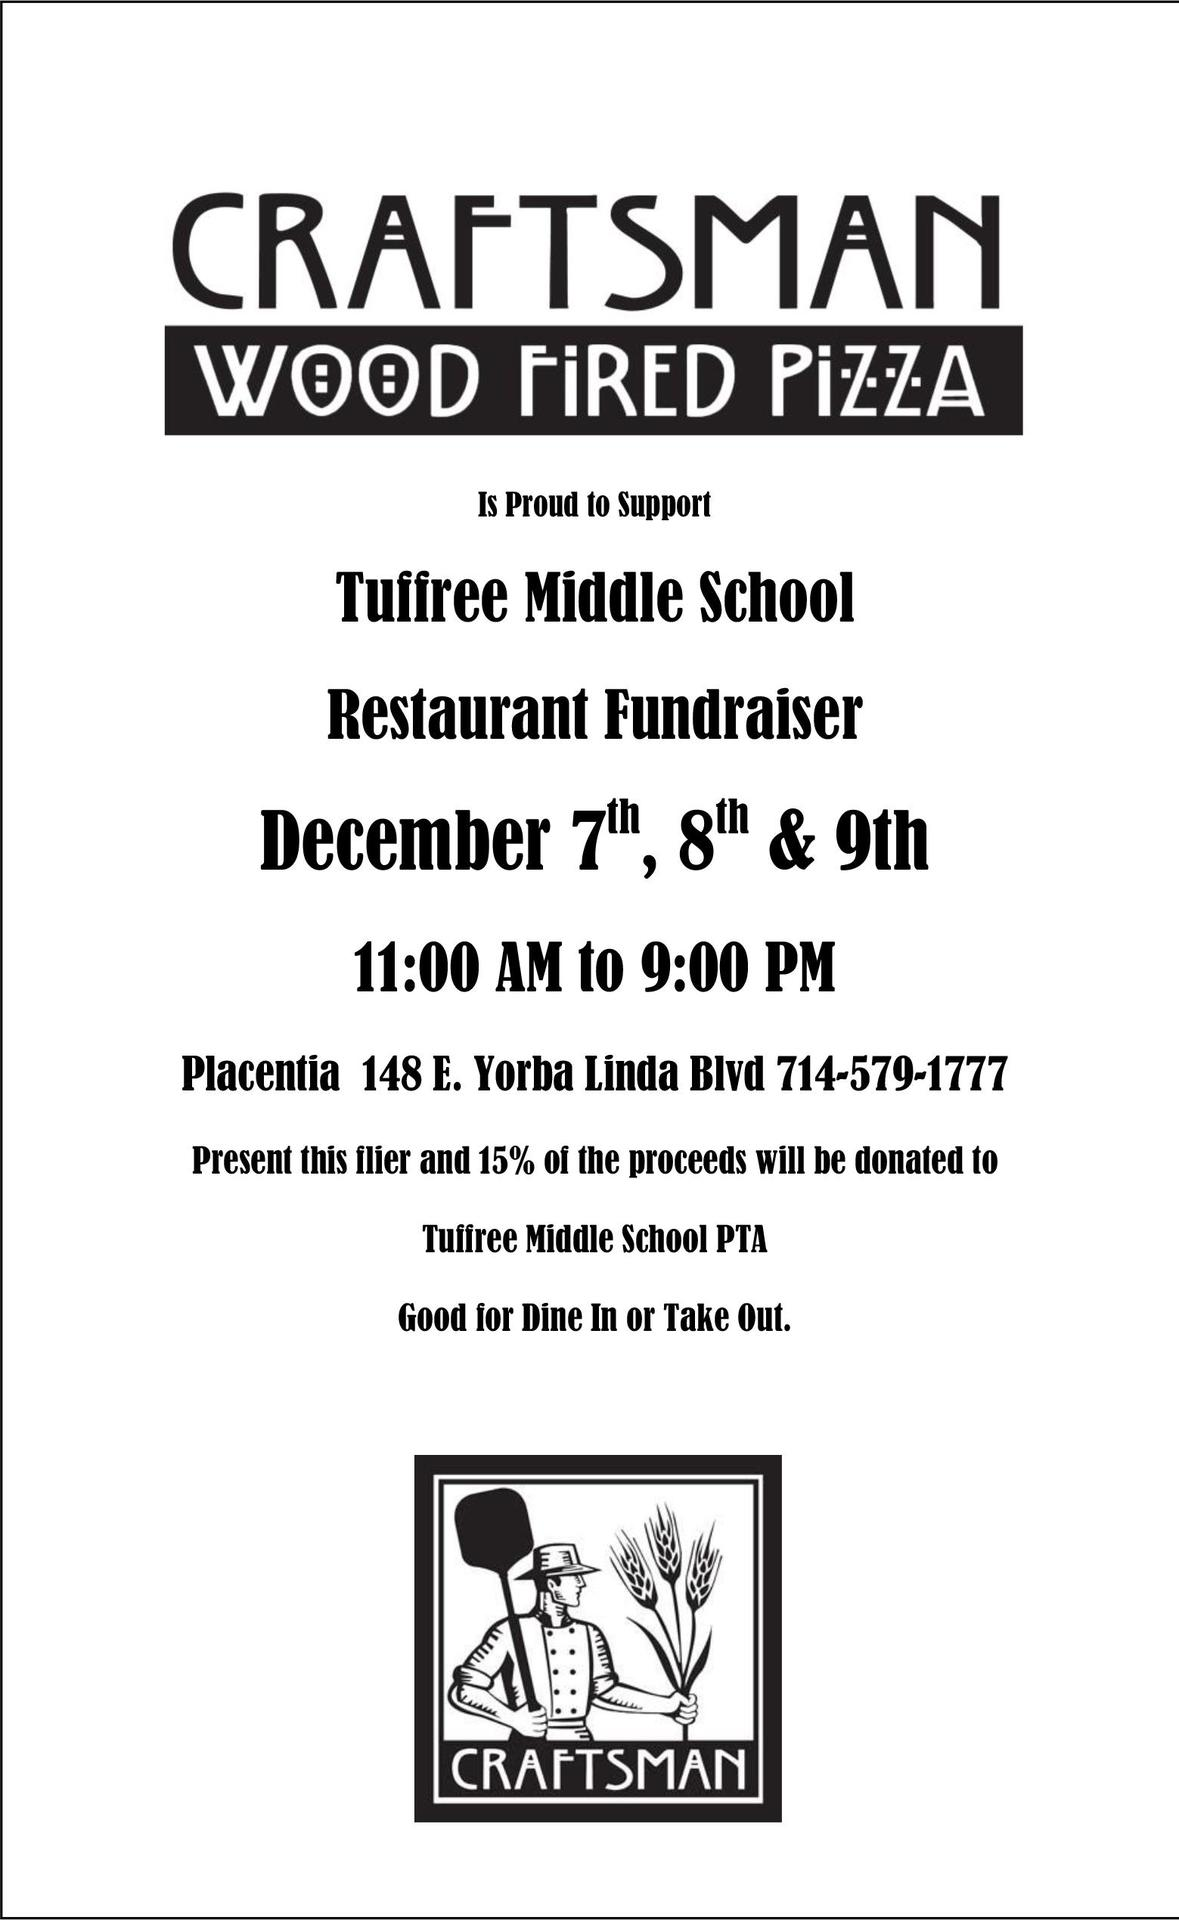 Craftsman Pizza fundraiser flyer